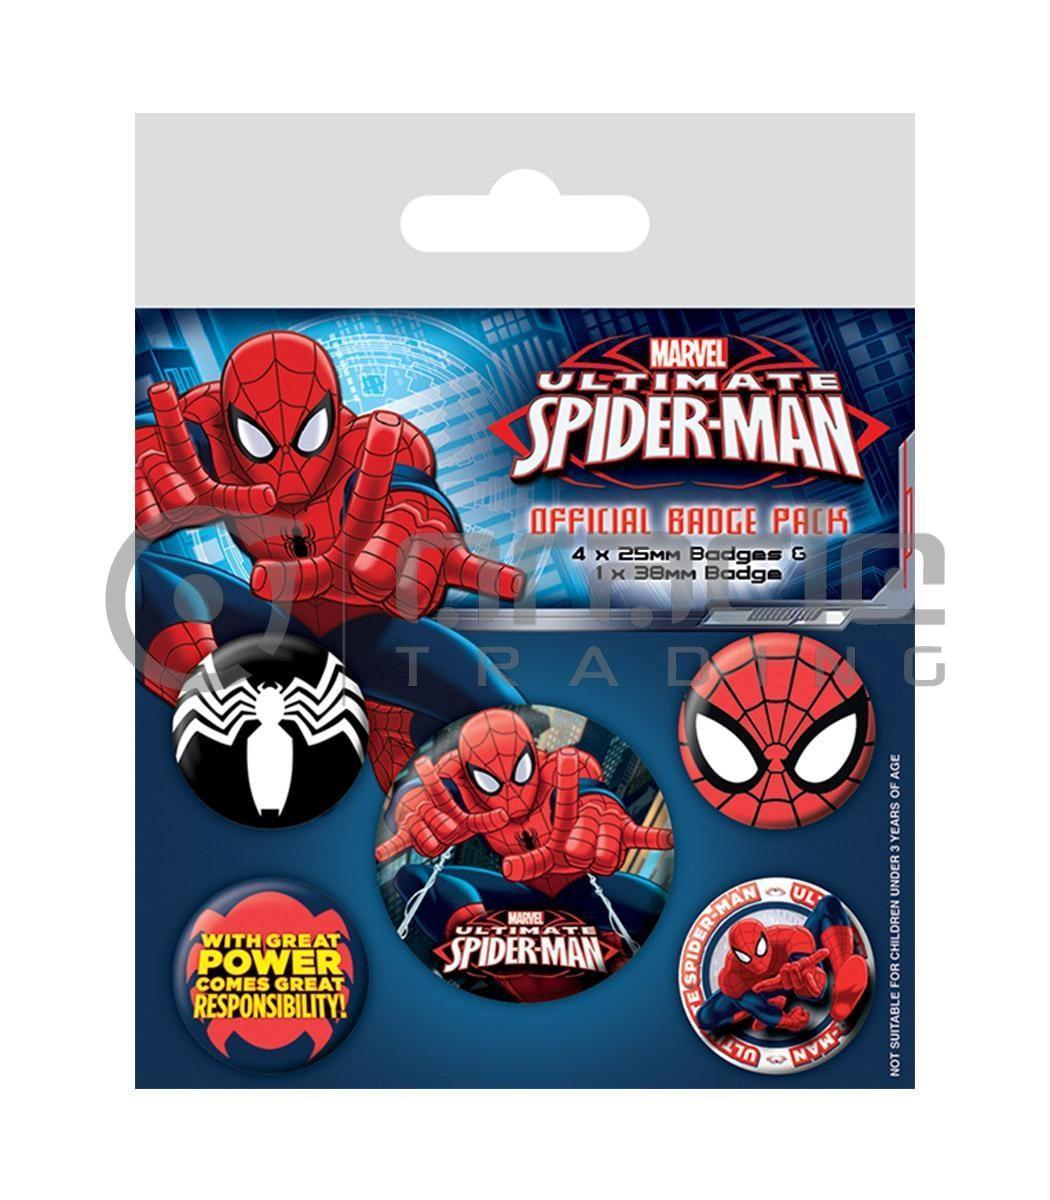 Spiderman Badge Pack